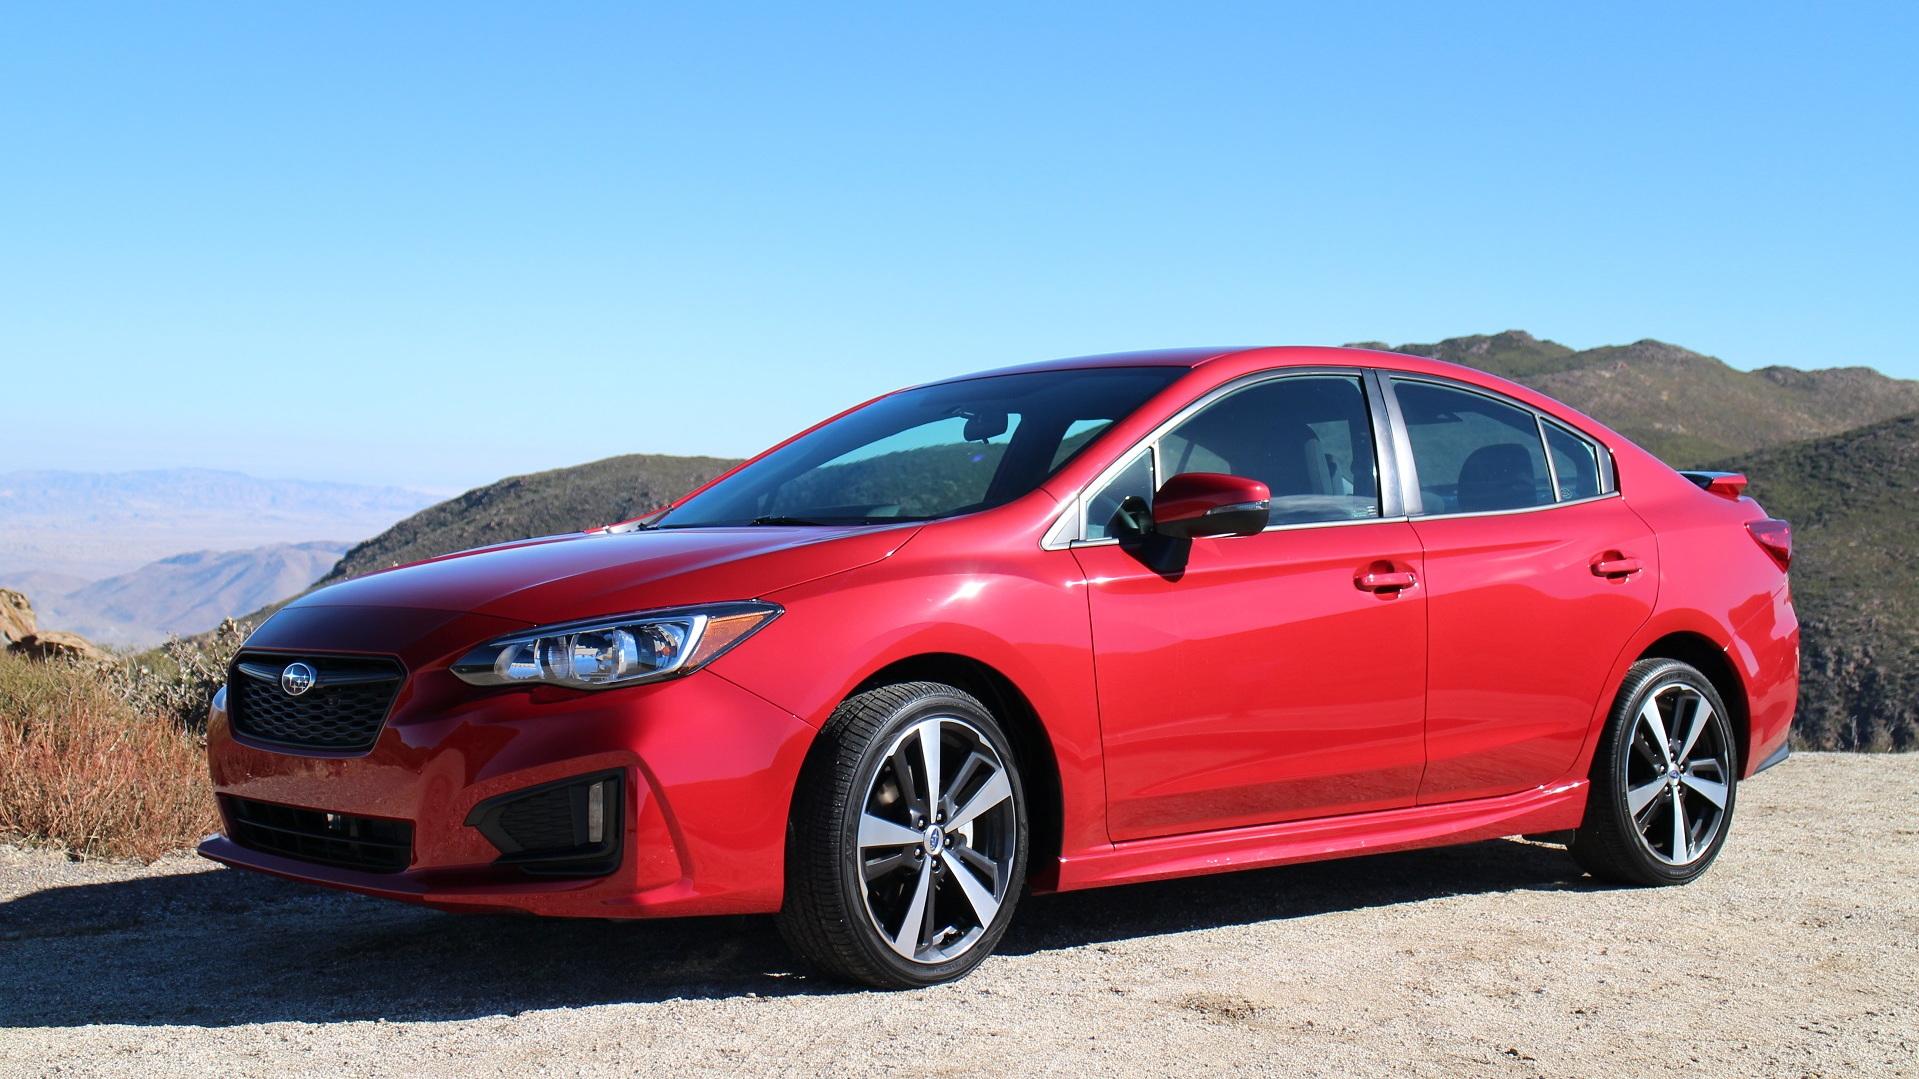 2017 Subaru Impreza, La Jolla, California, Dec 2016